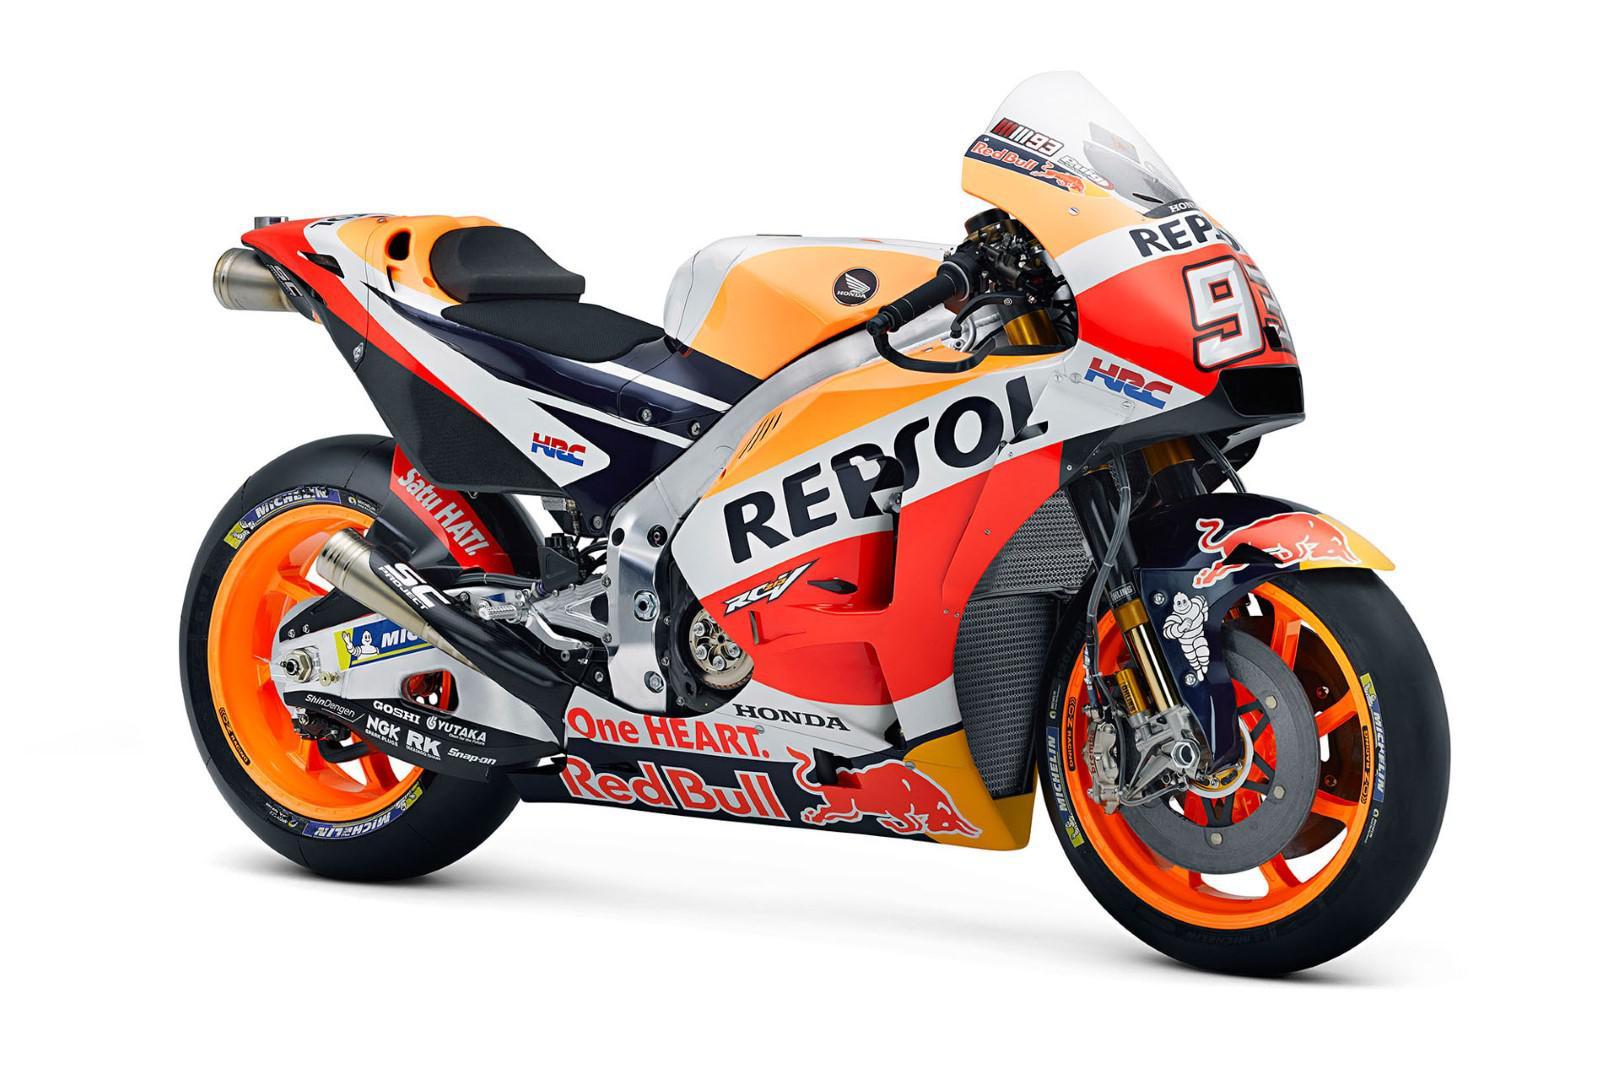 moto-gp-honda-evolution-de-la-puissance-1408-18.jpg